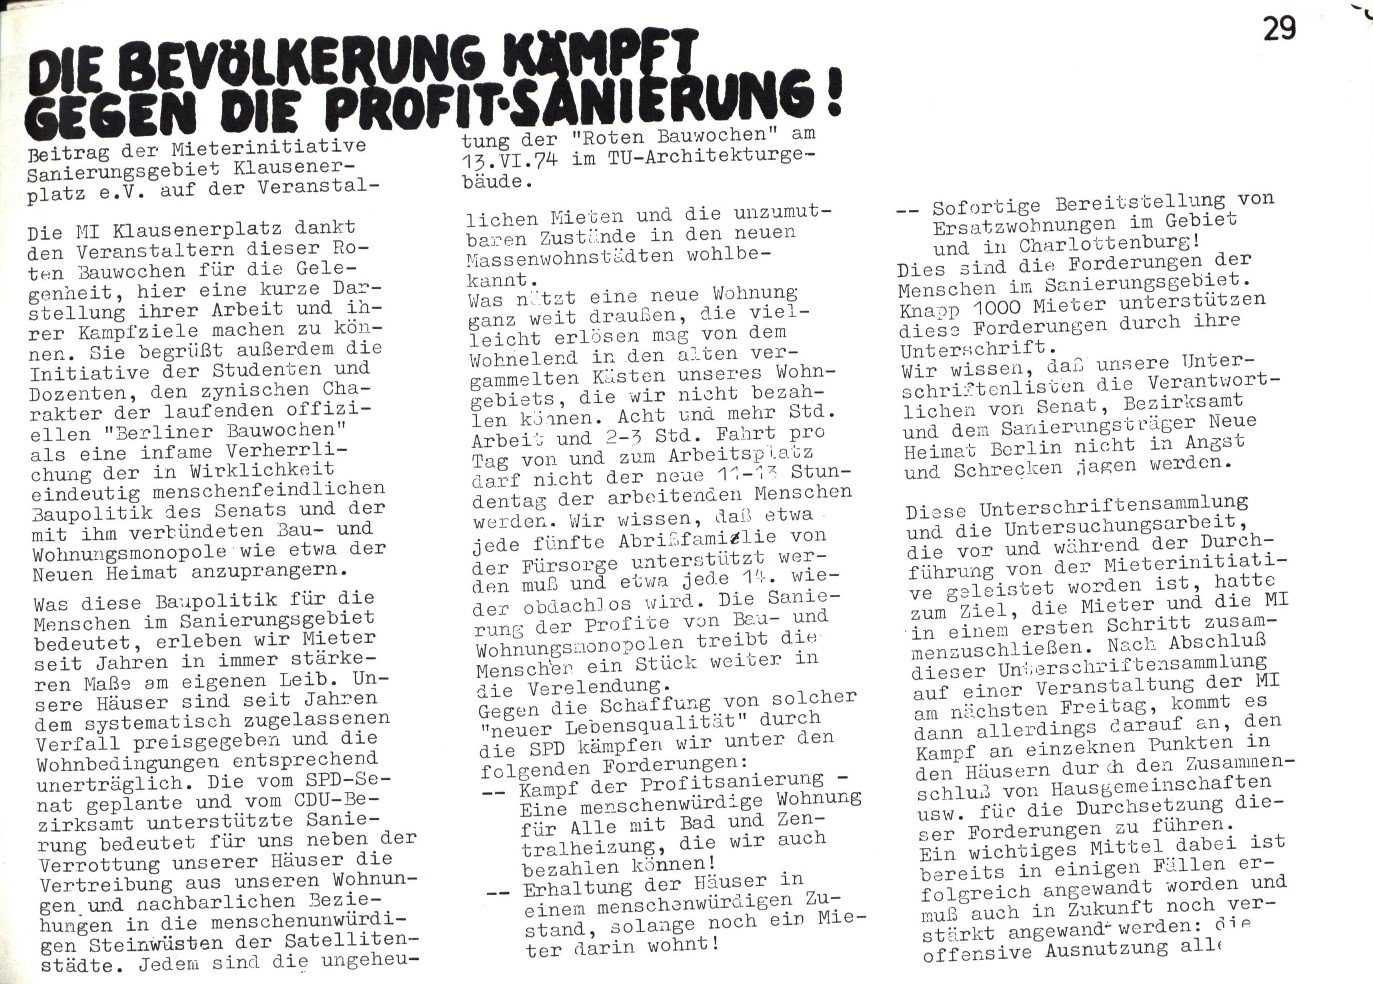 Berlin_KSV_1974_Rote_Bauwochen_40